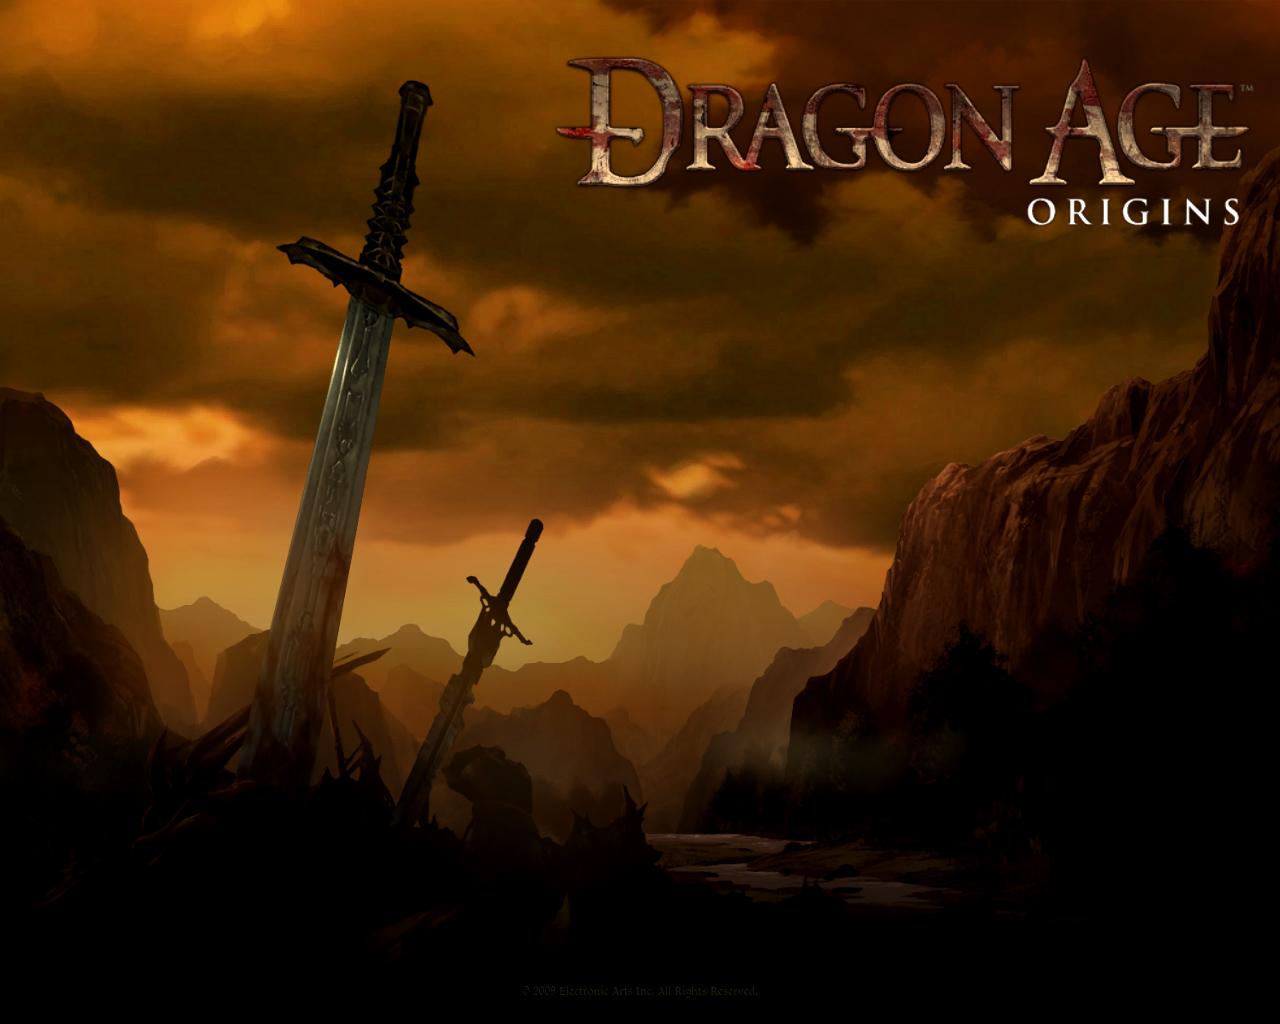 Dragon Age Origins Wallpapers: Where Is Wallpaper: Dragon Age Origins